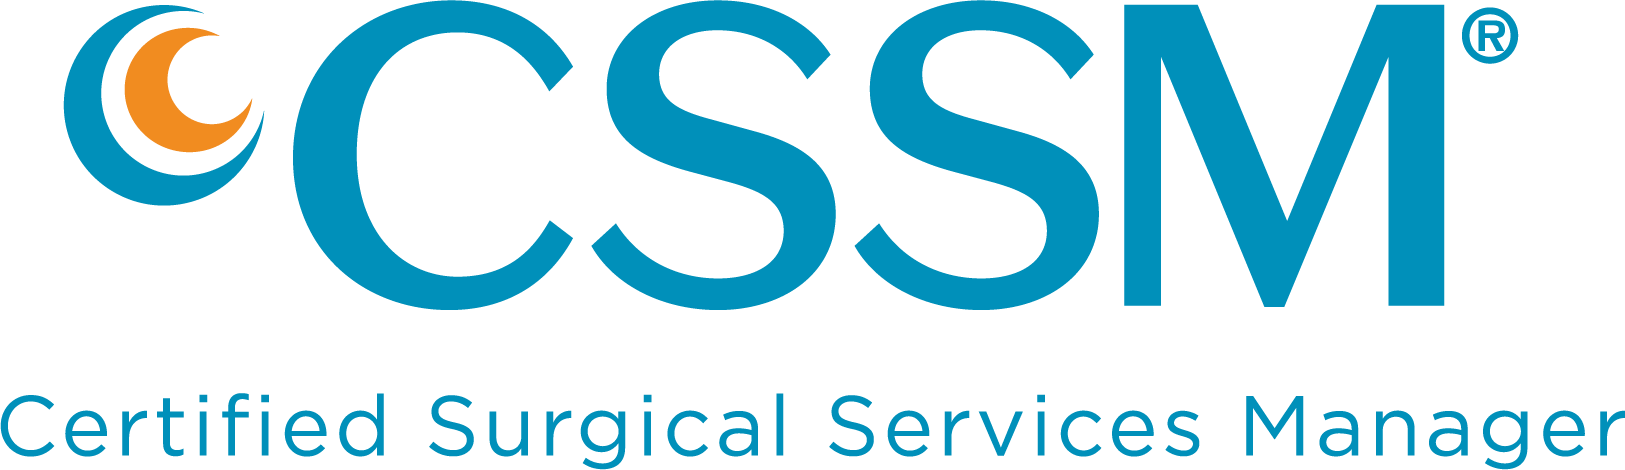 CSSM_tag.png